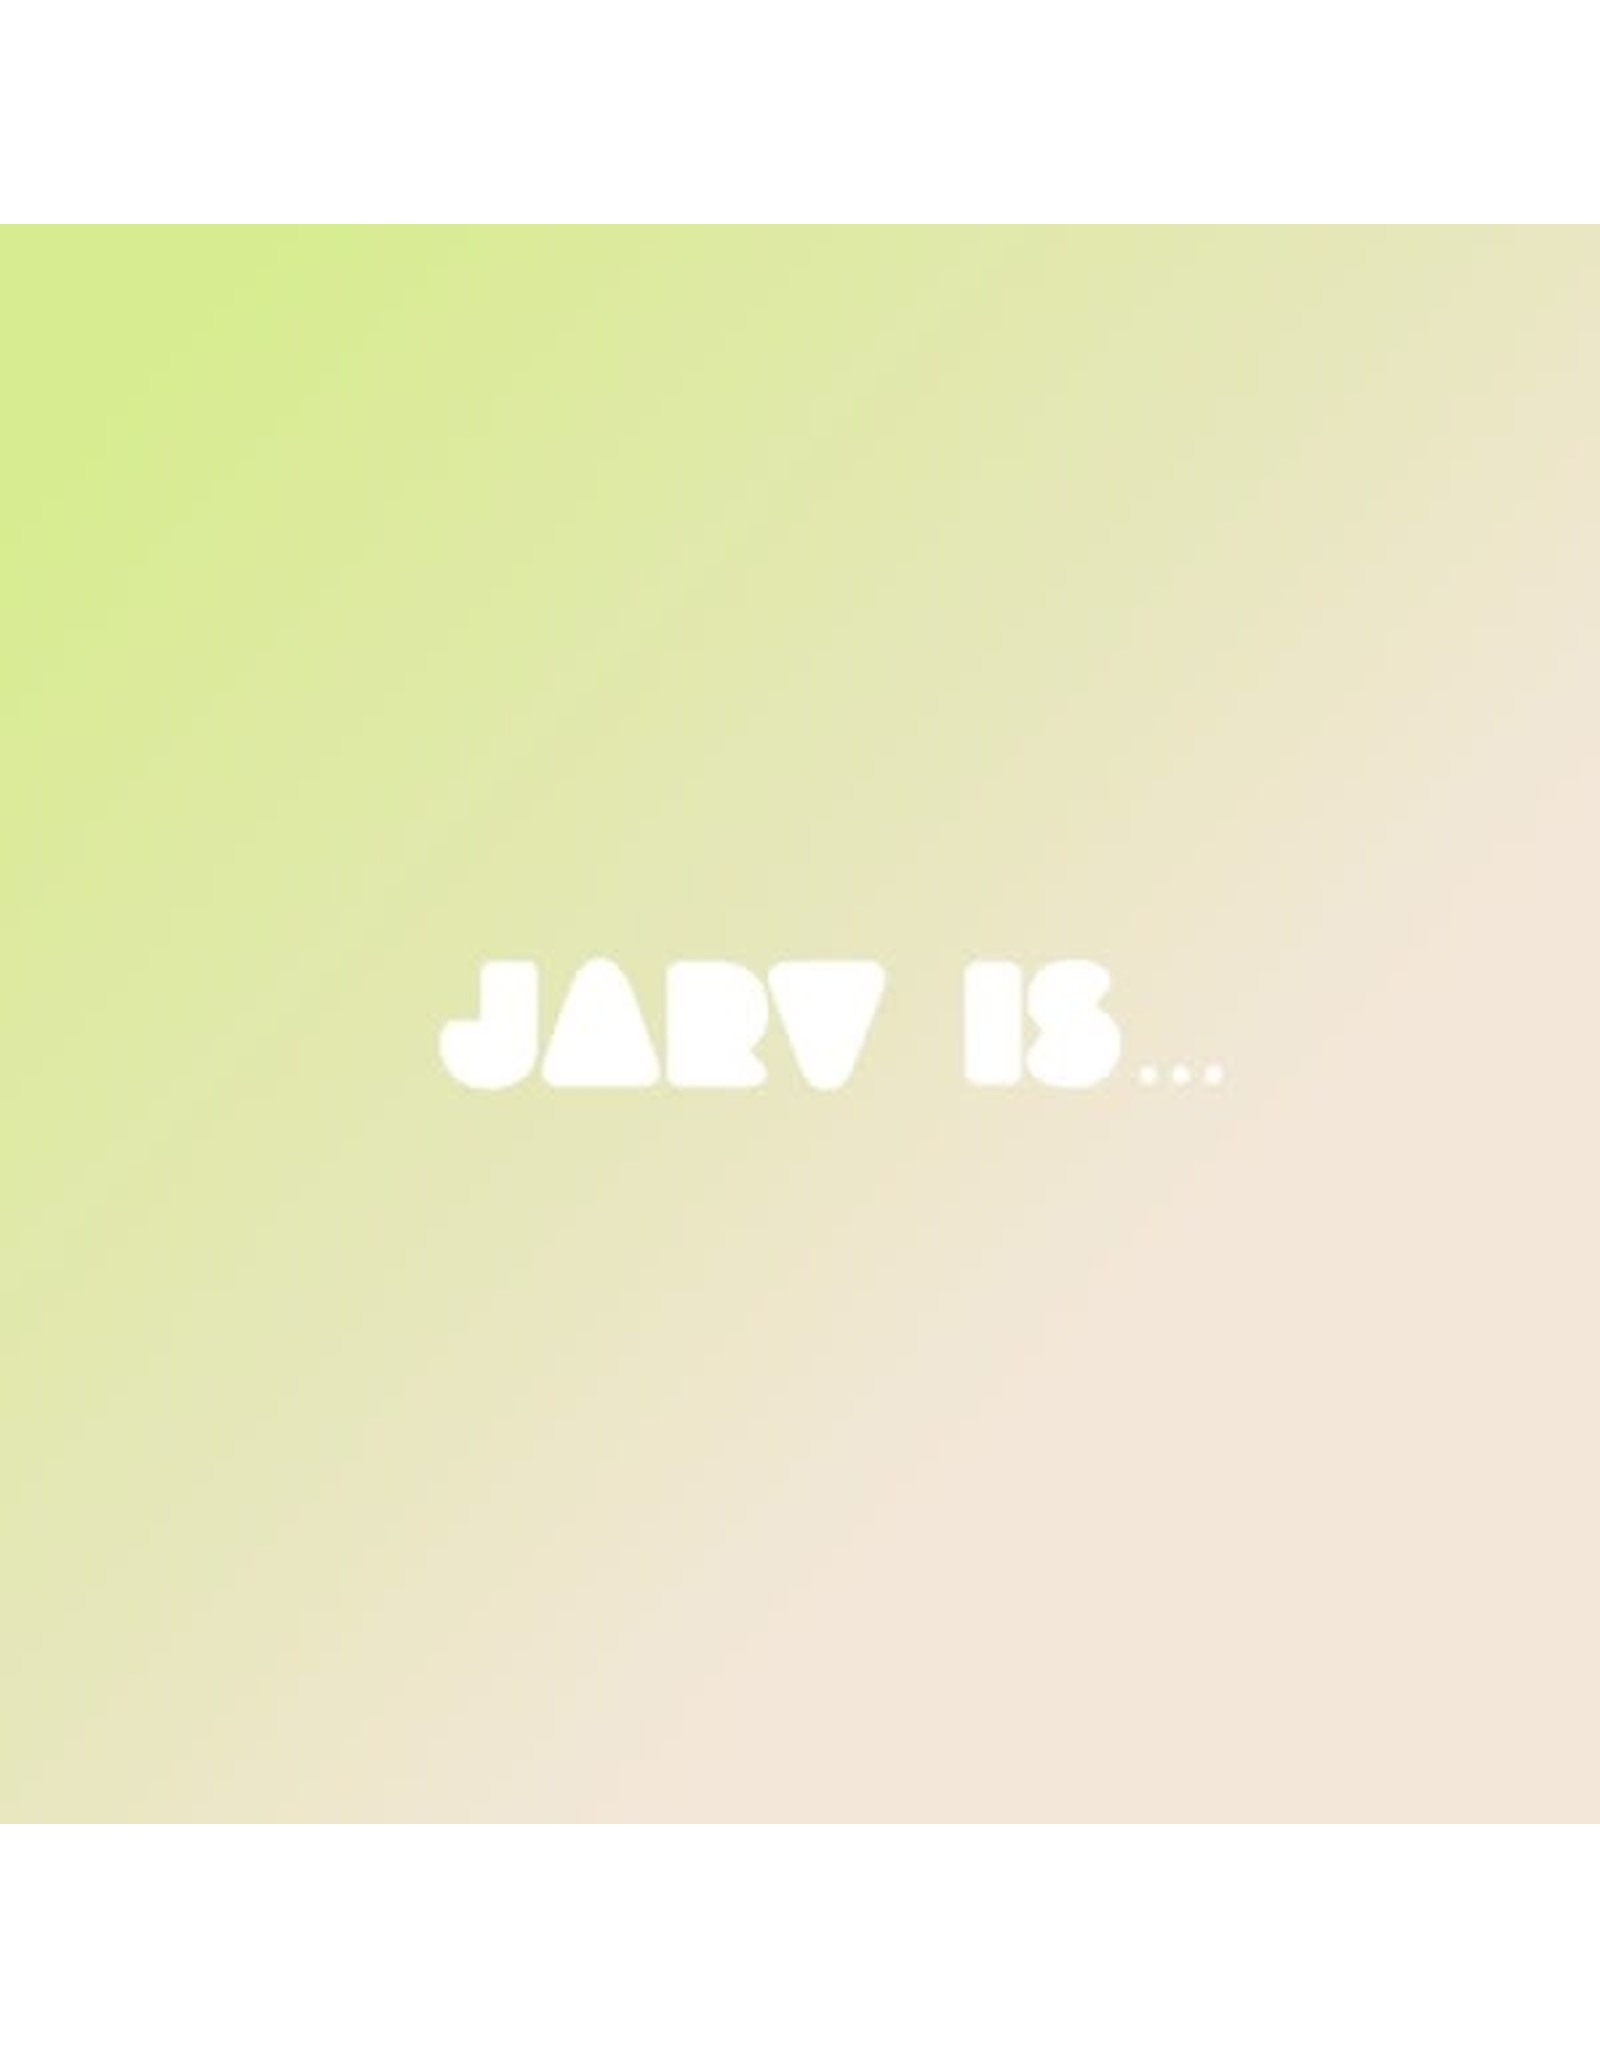 Cocker, Jarvis - Beyond the Pale (clear orange vinyl)